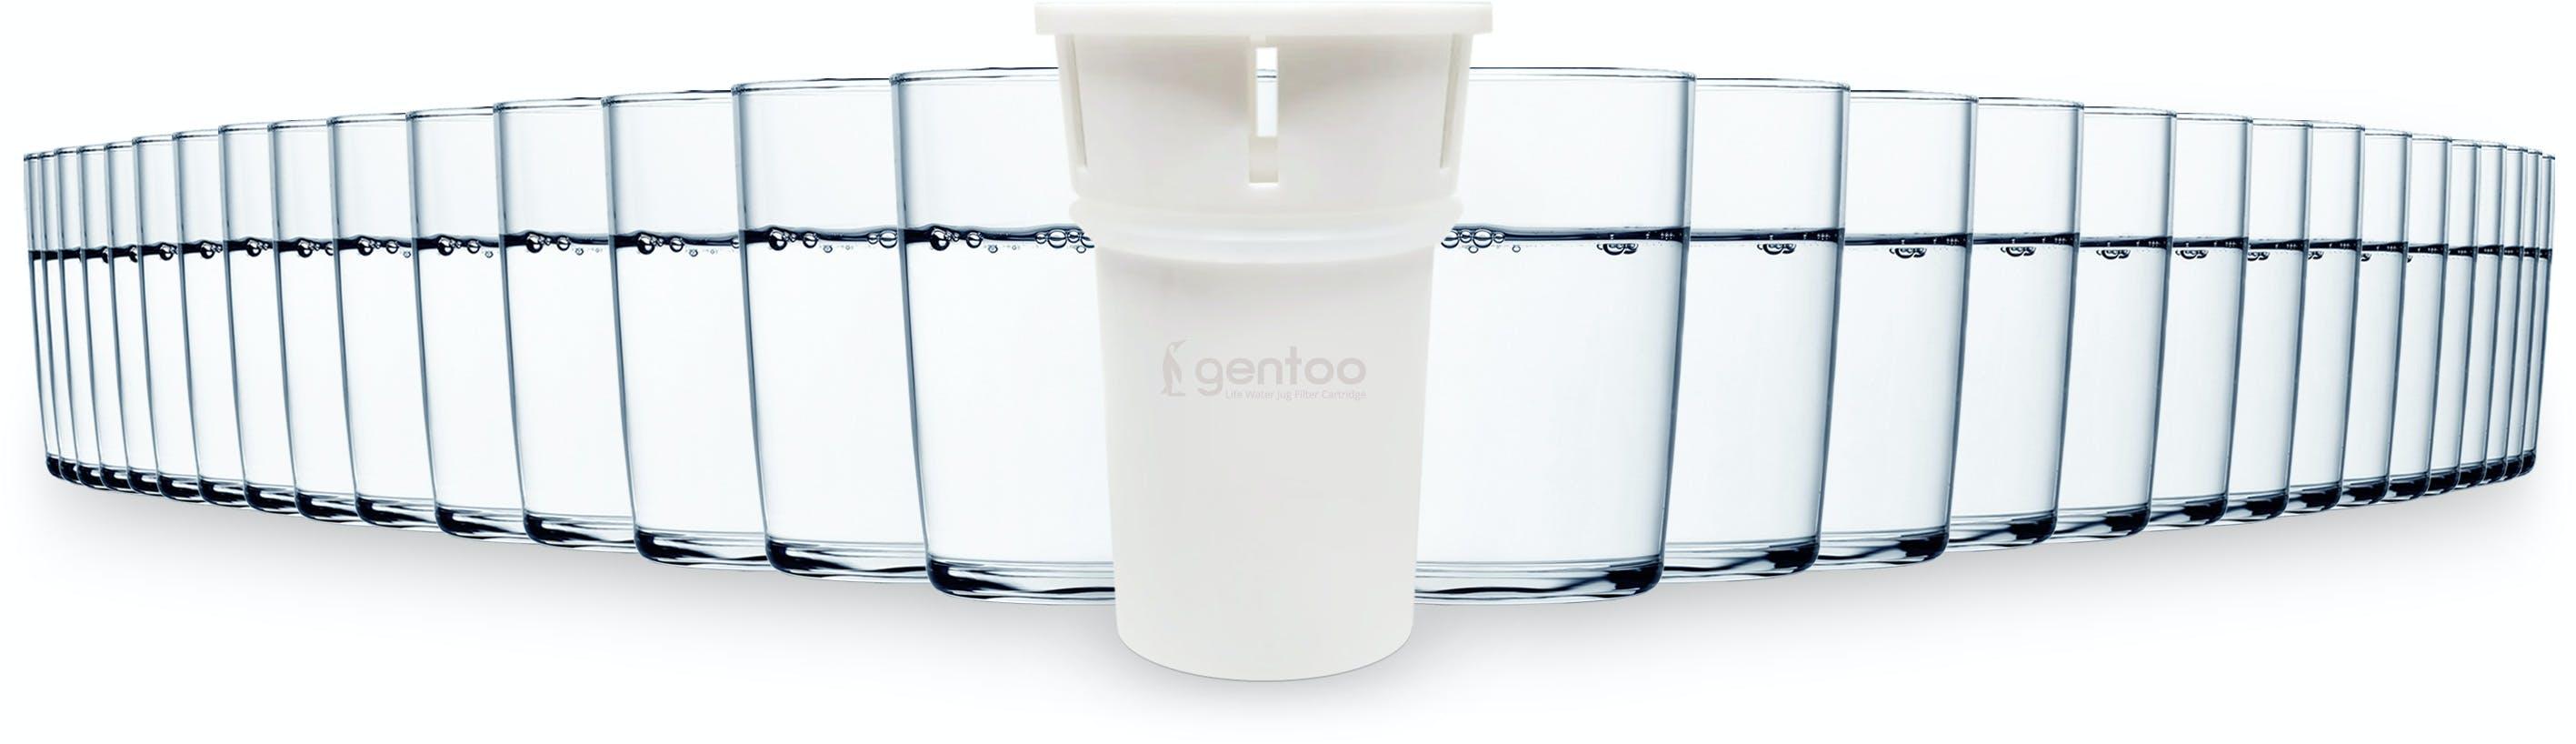 Gentoo Water Filter